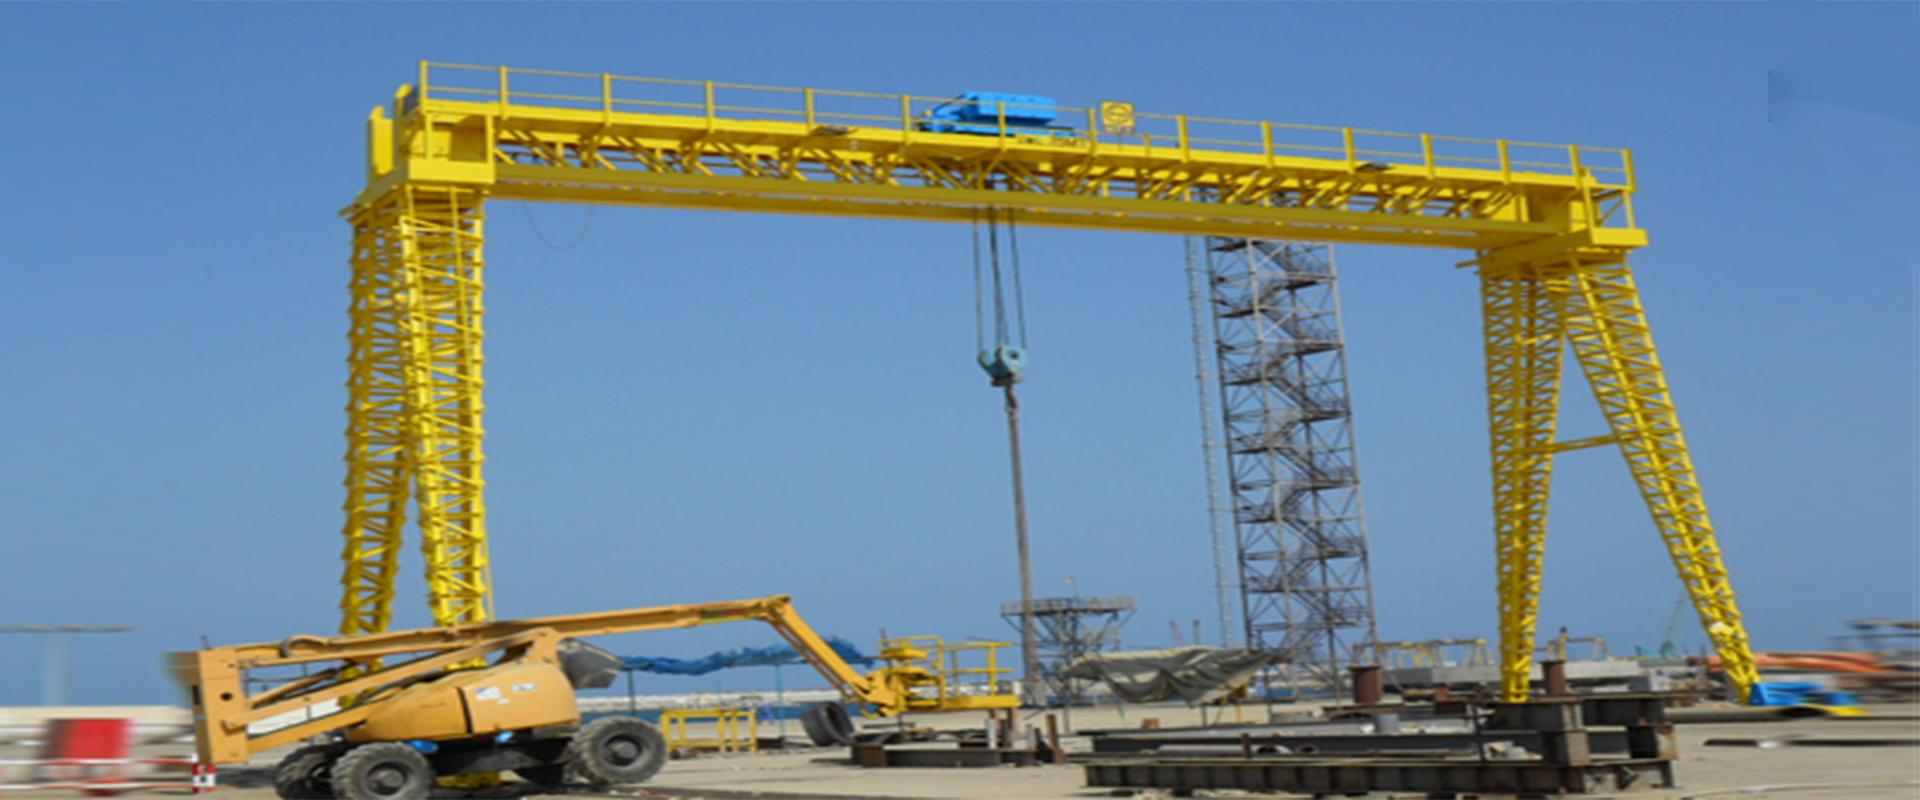 Overhead Cranes Pakistan : Overhead gantry cranes pakistan elevator lifting and